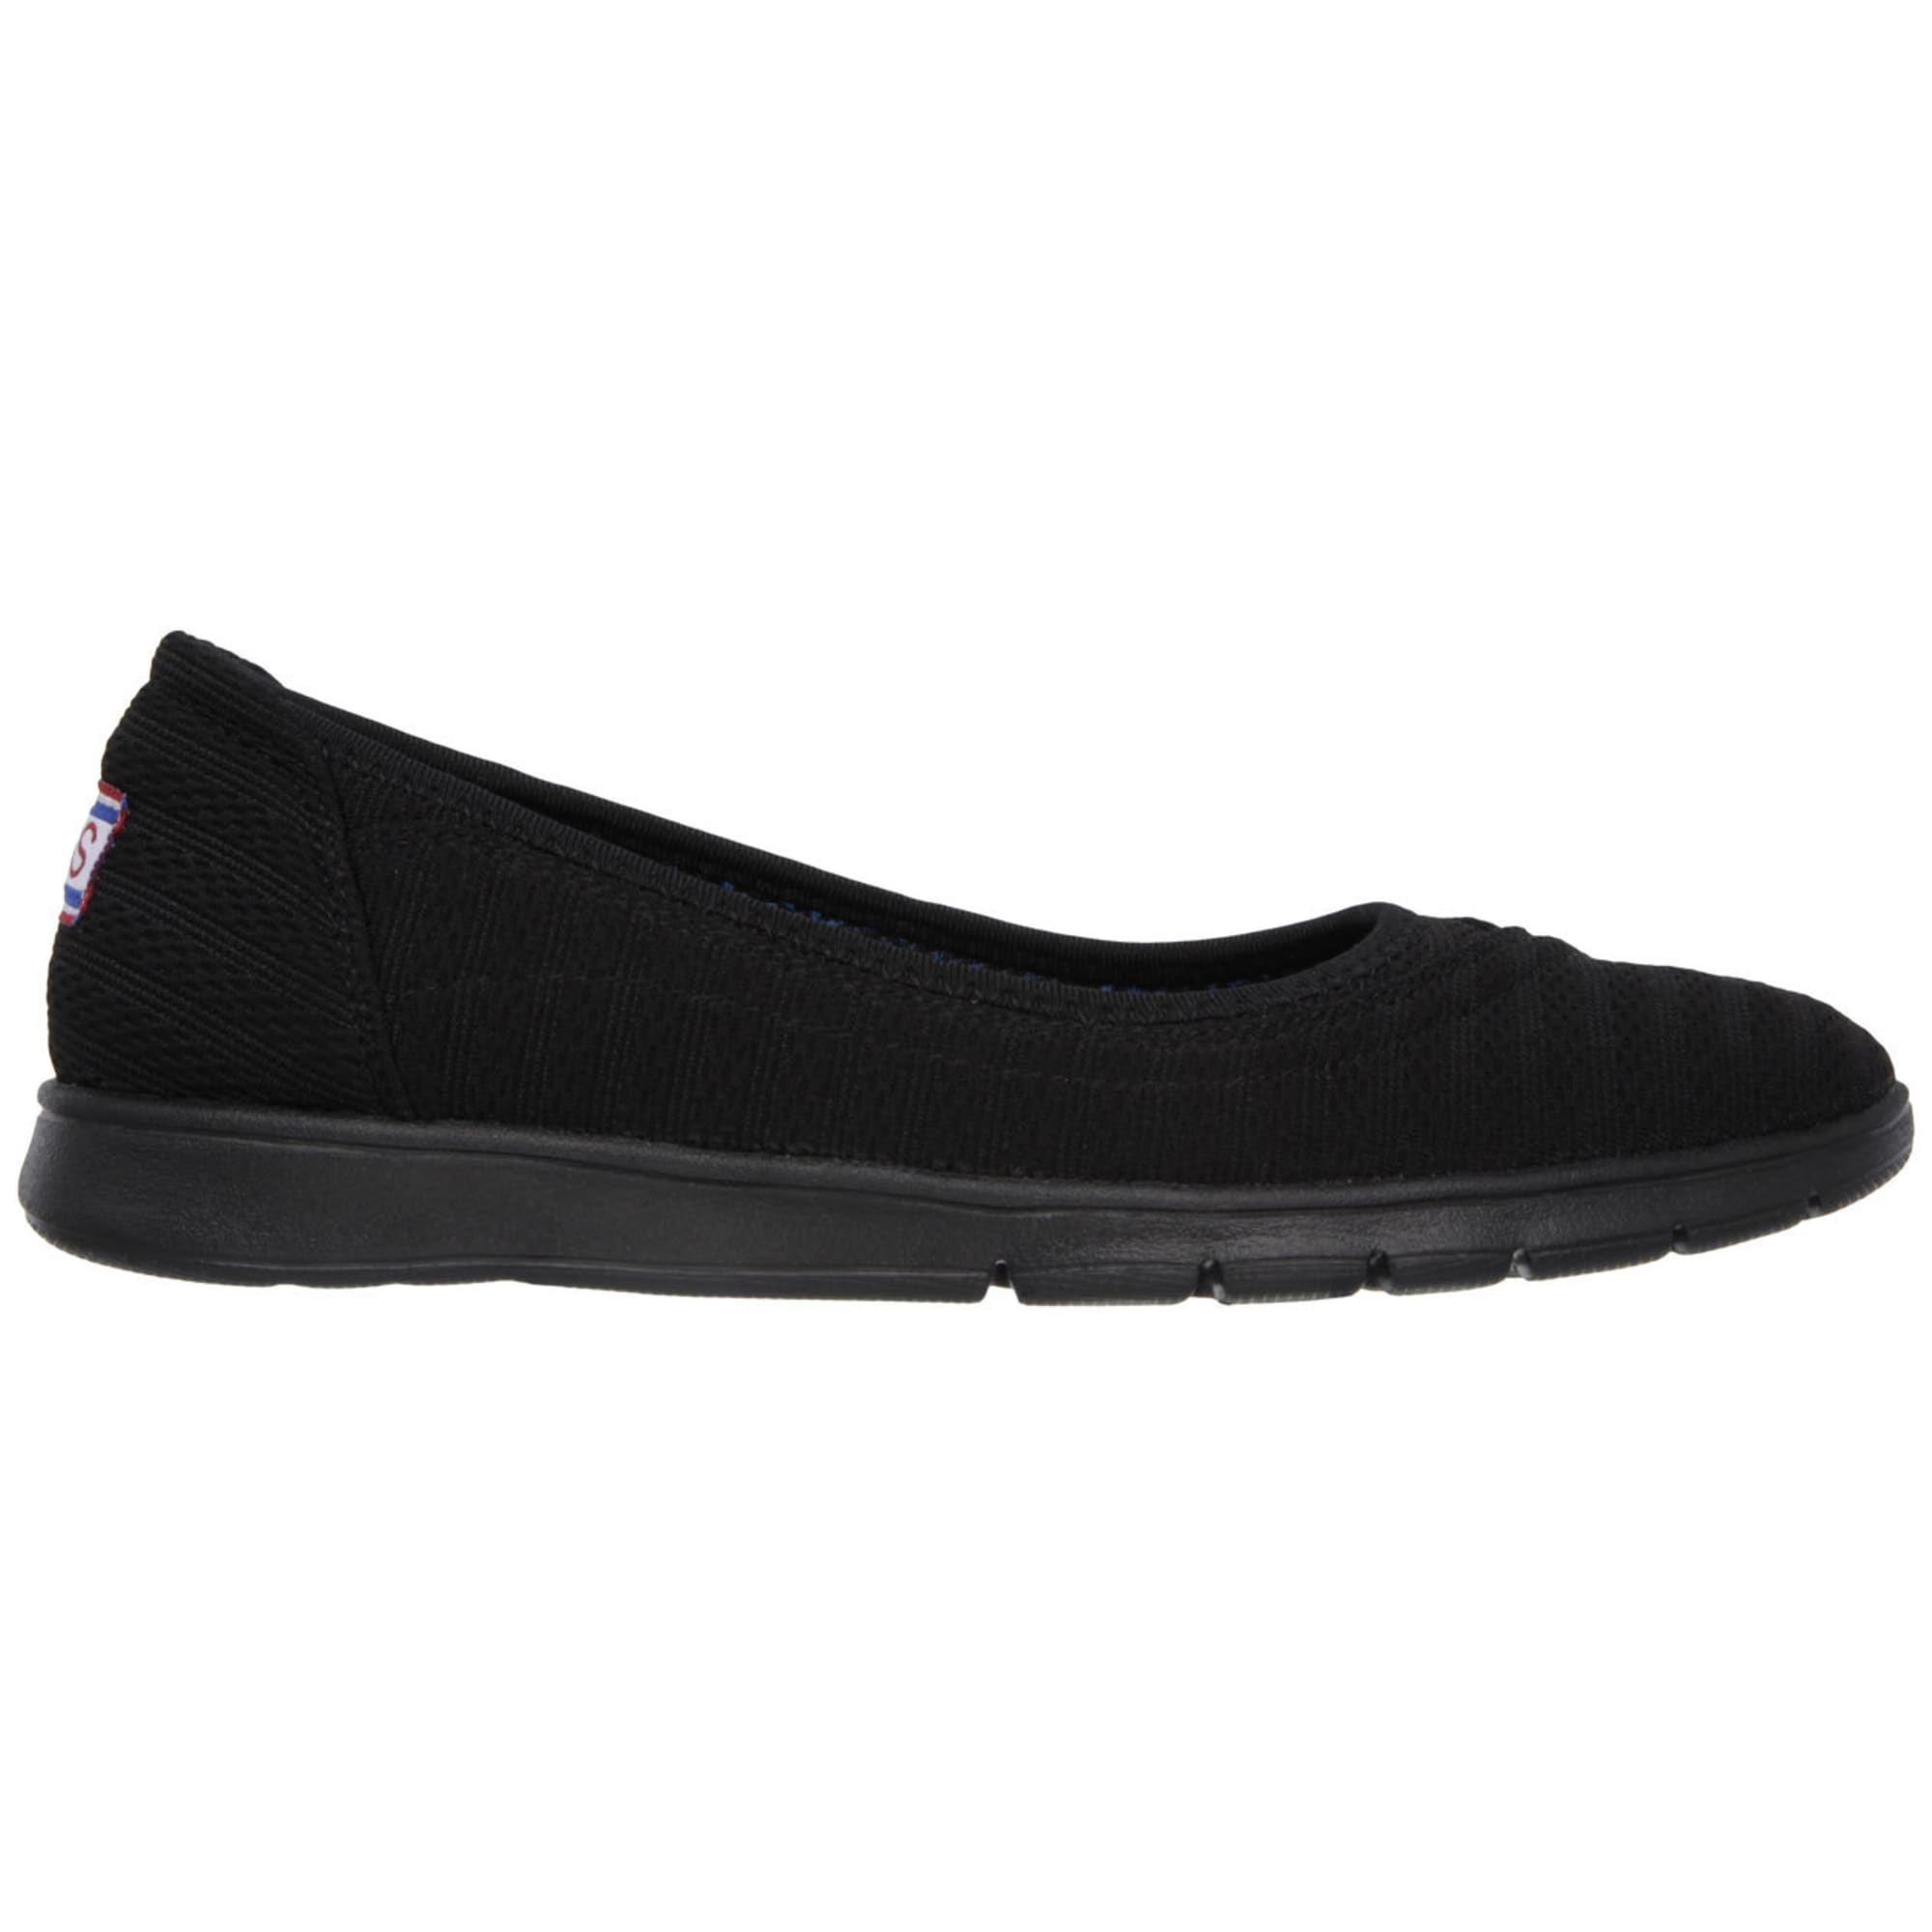 Bobs Pureflex Supastar Flat Shoes